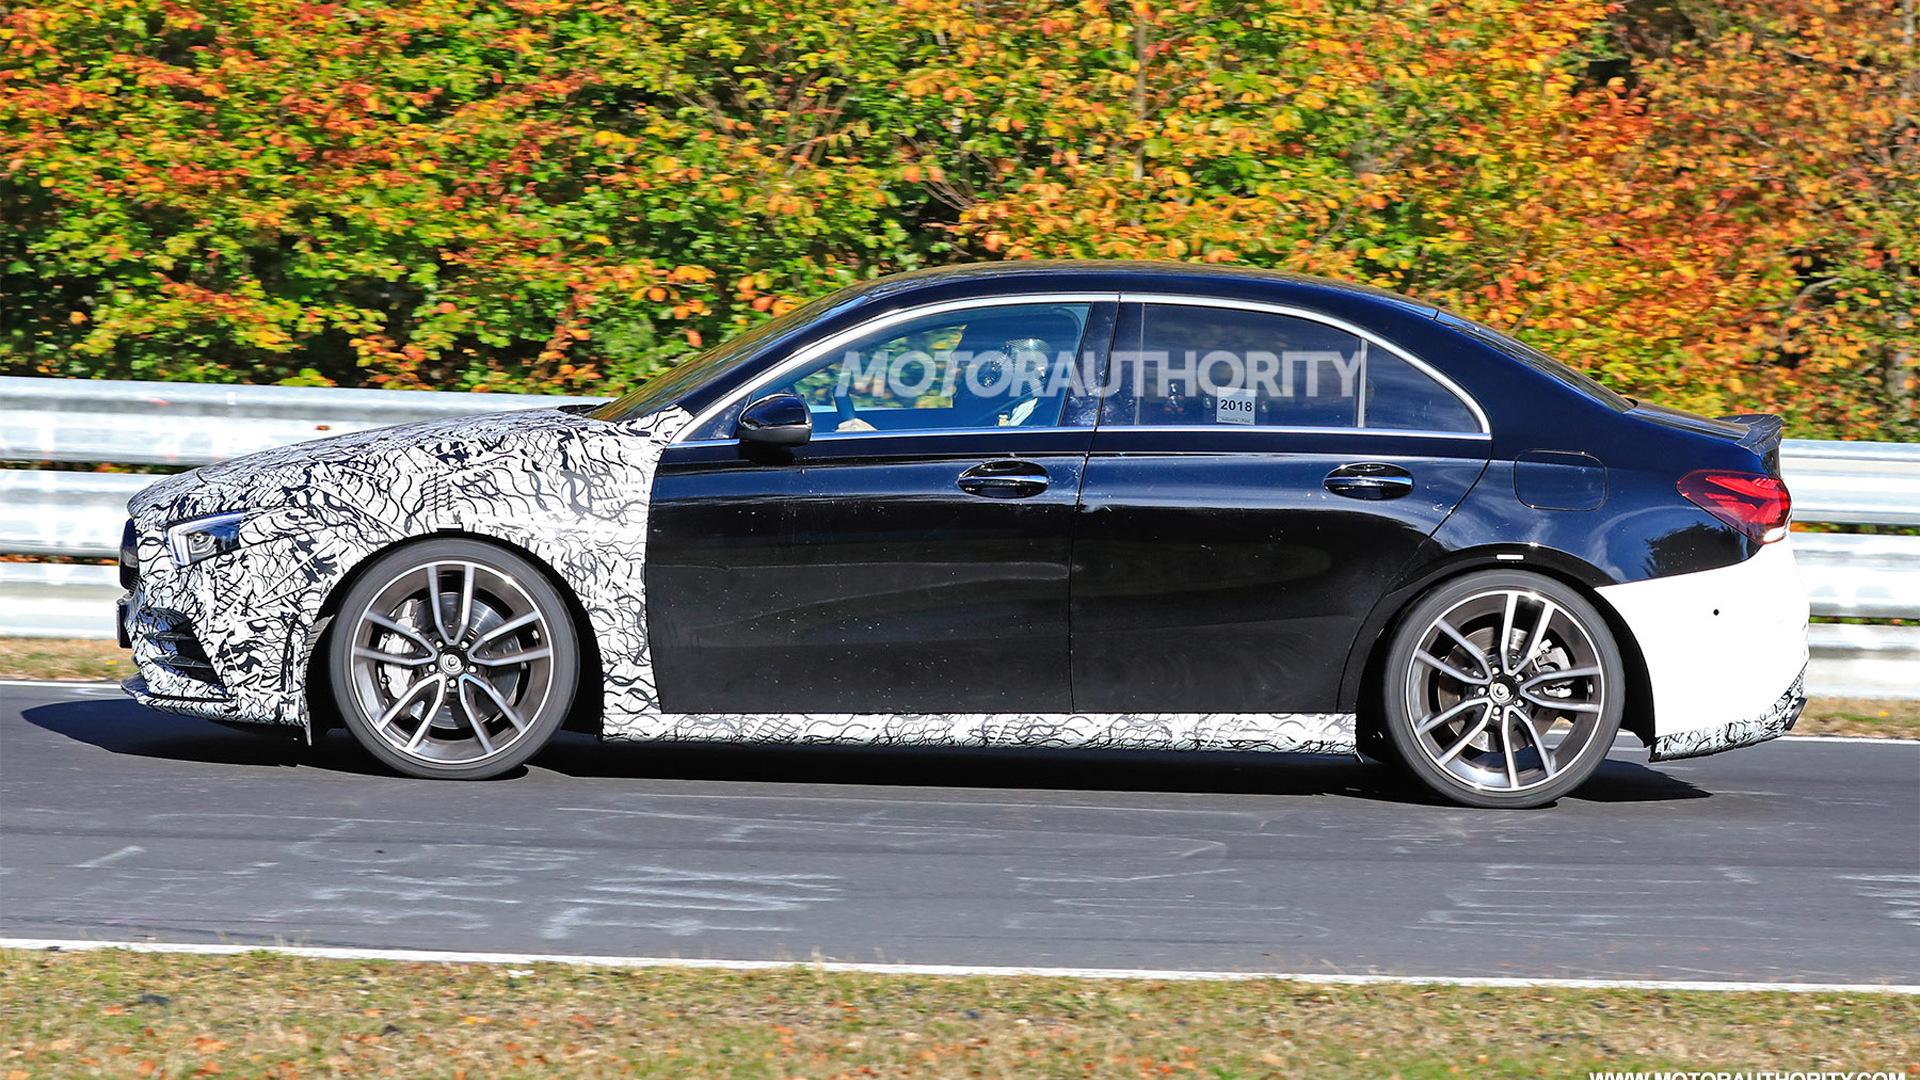 2019 Mercedes-AMG A35 spy shots - Image via S. Baldauf/SB-Medien